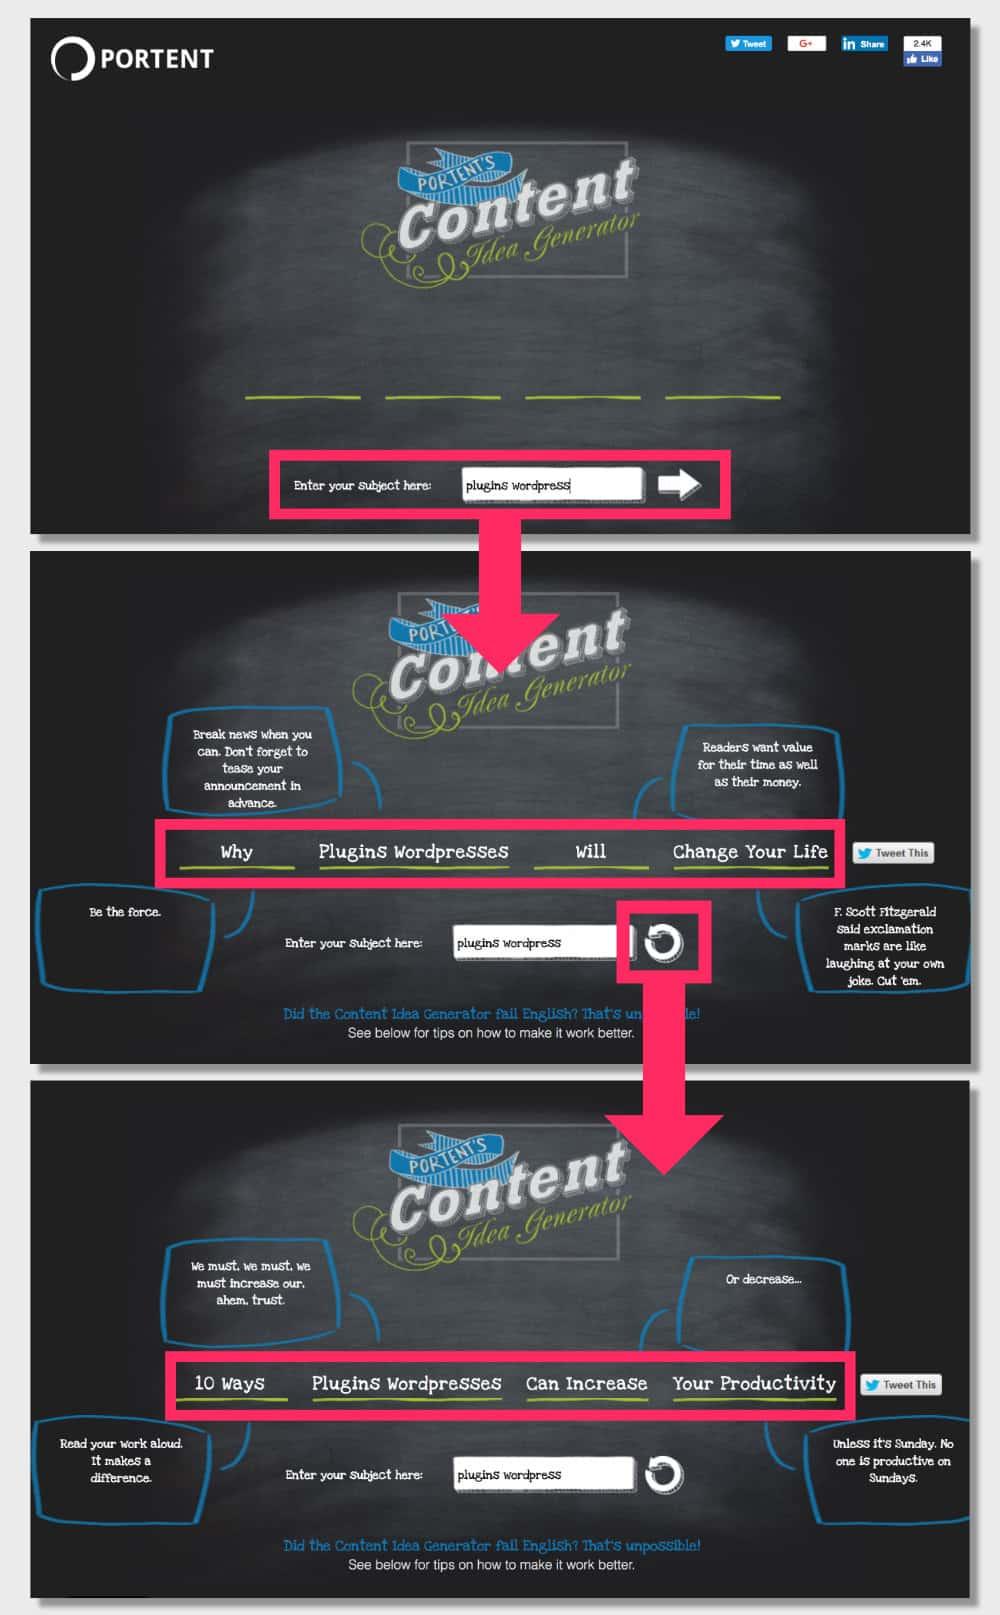 Portent's Content Idea Generator - outils SEO gratuits